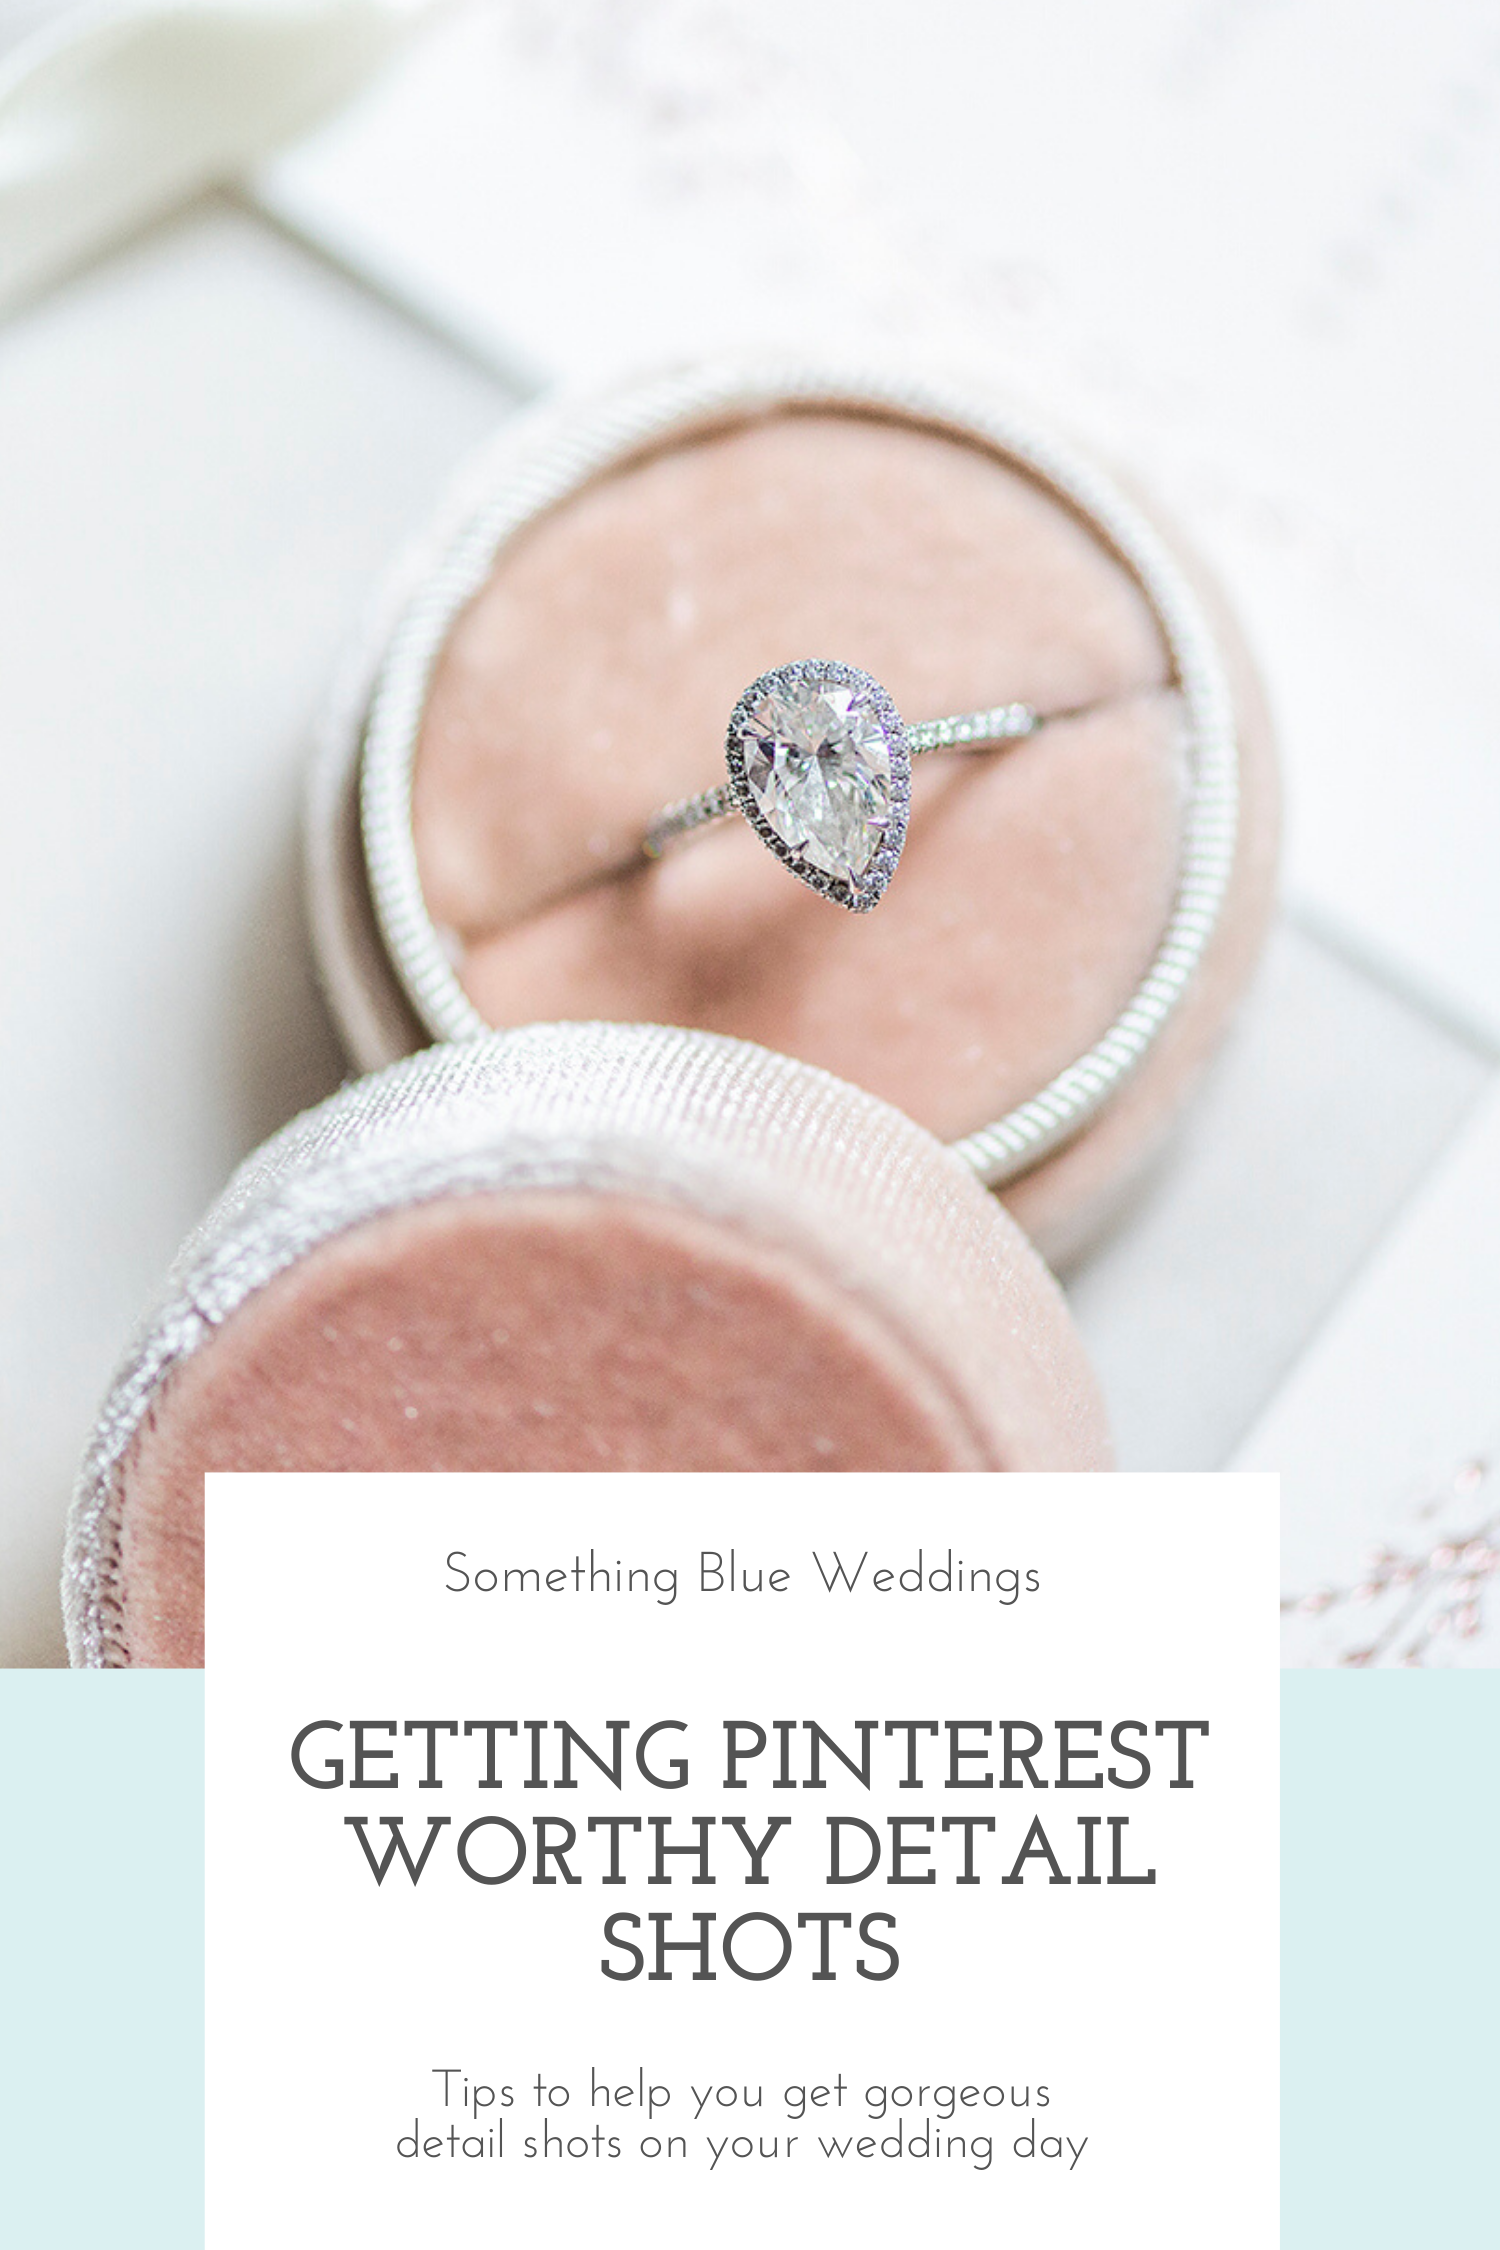 Getting Pinterest Worthy Detail Shots | Something Blue Weddings